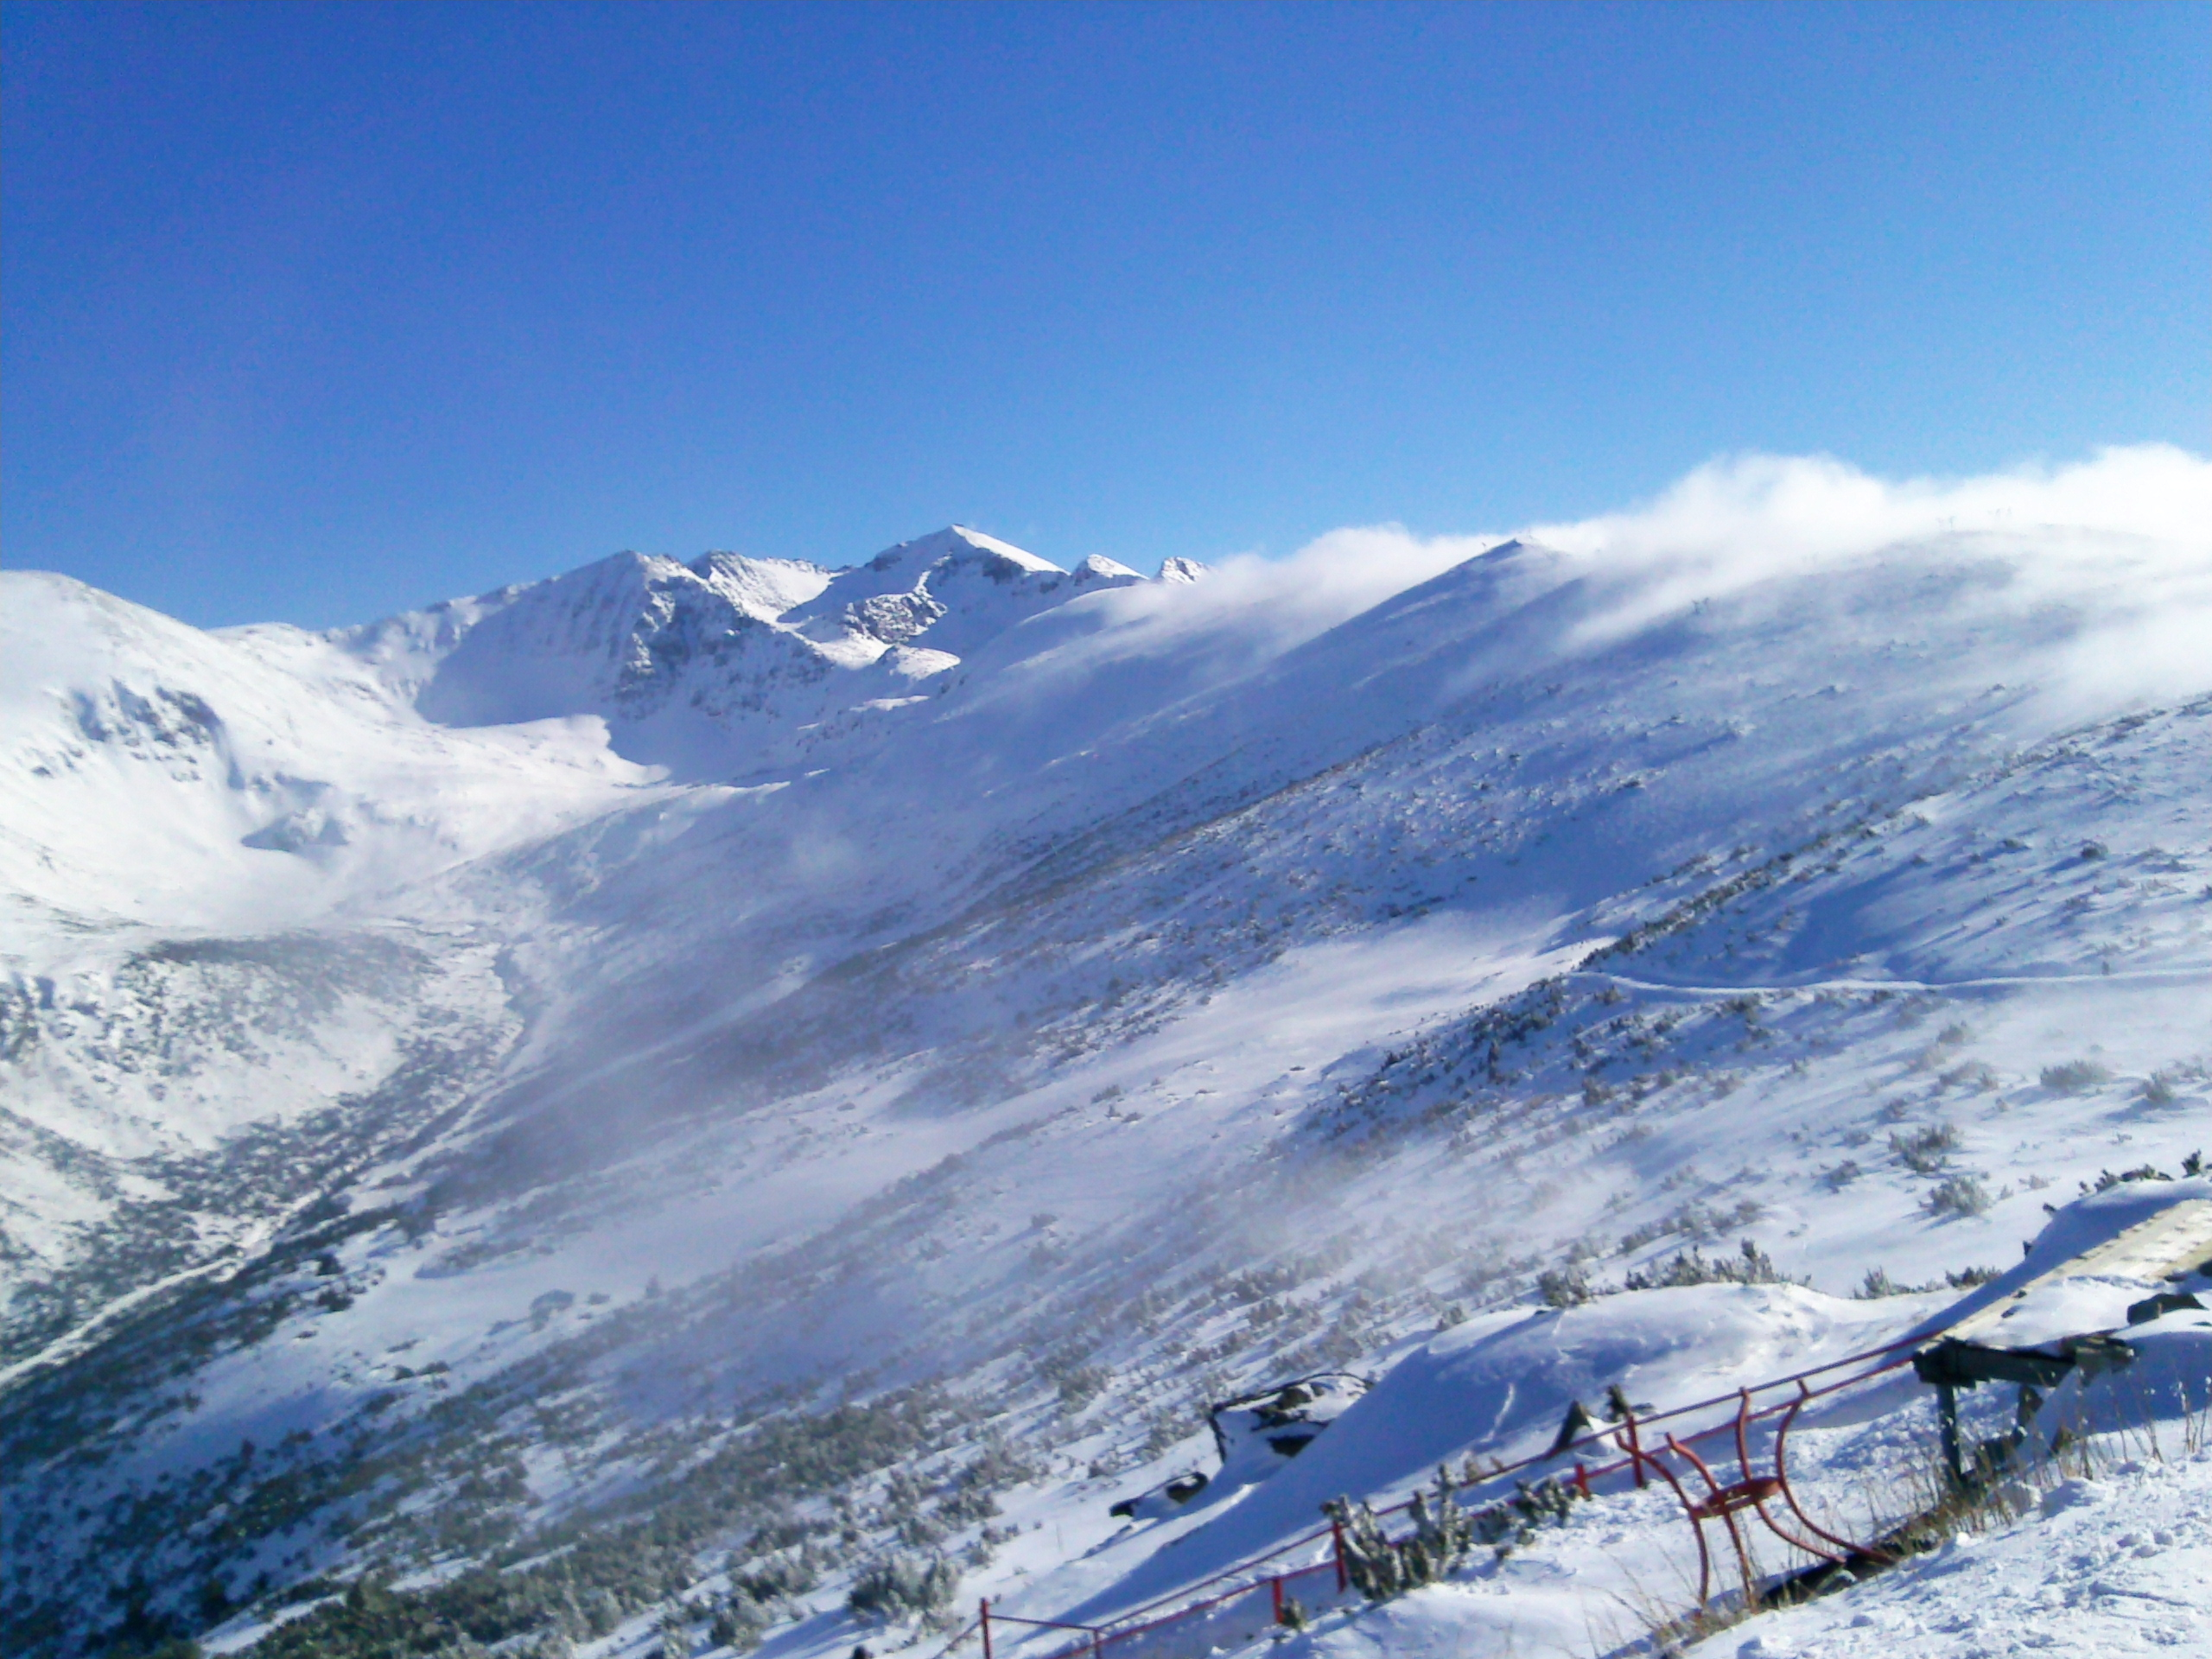 Musala peak & Markudjik area, Borovets